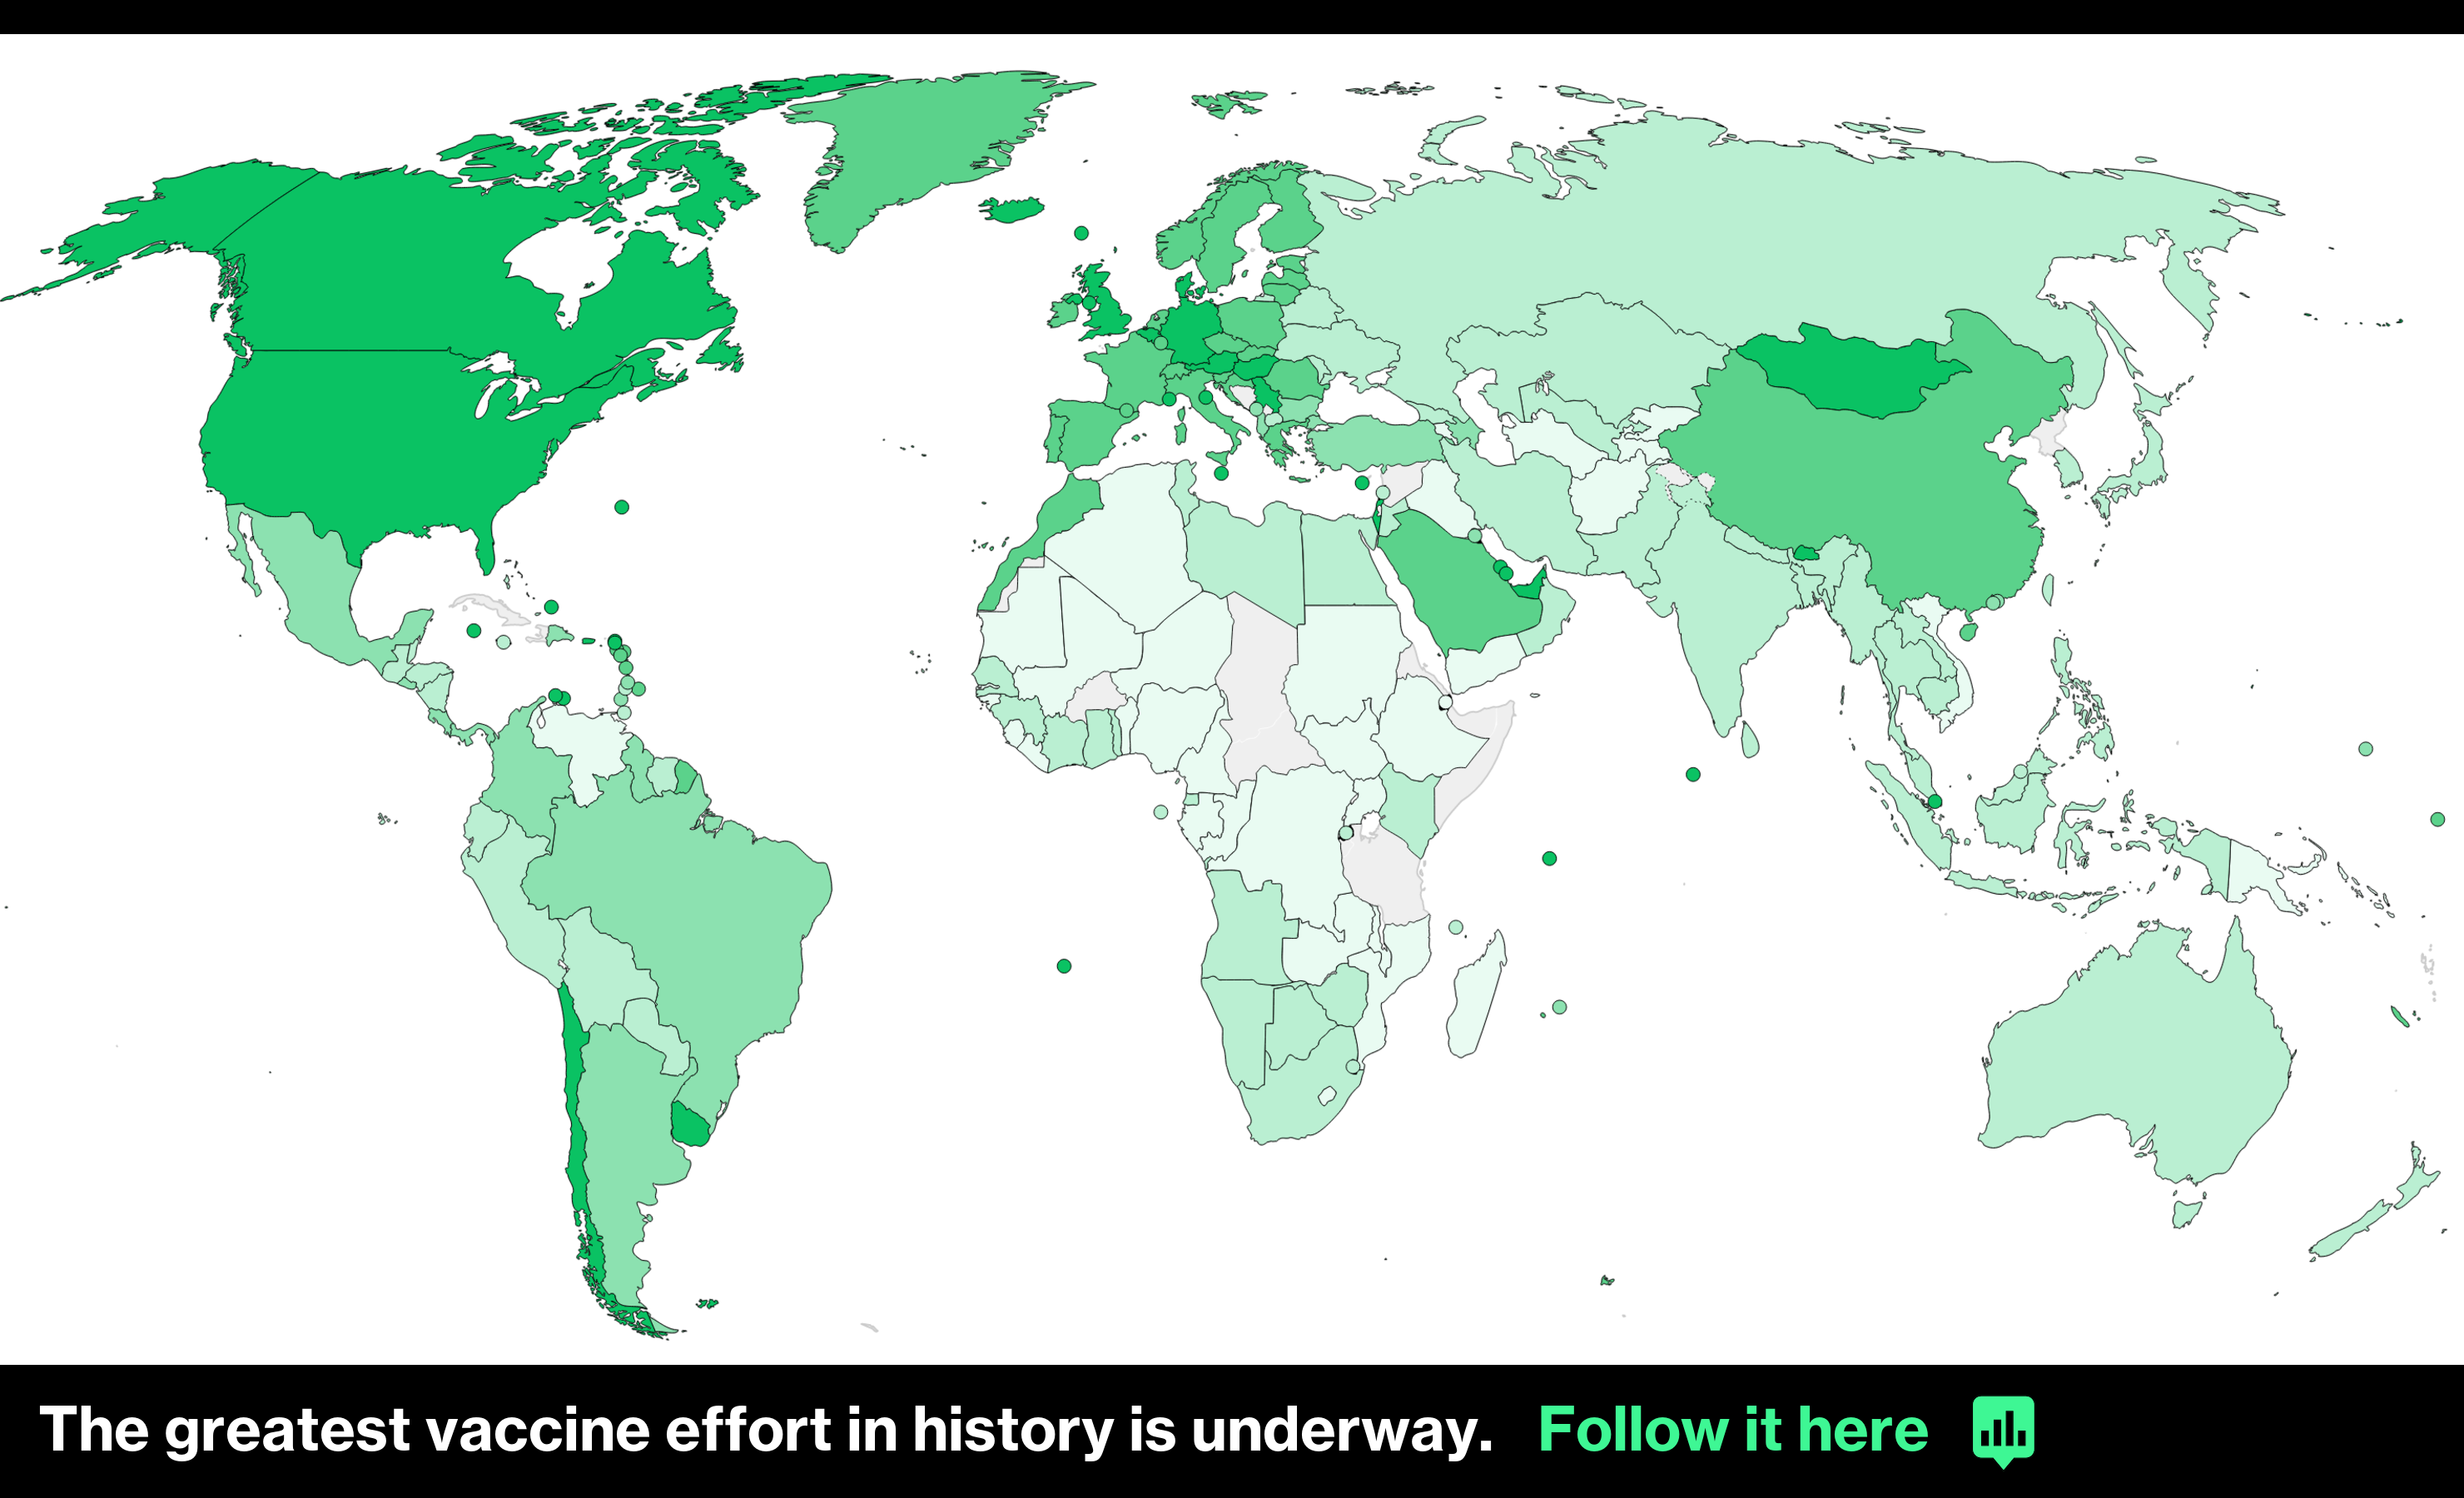 covid-vaccine-tracker-global-distribution-world-vaccination-inline